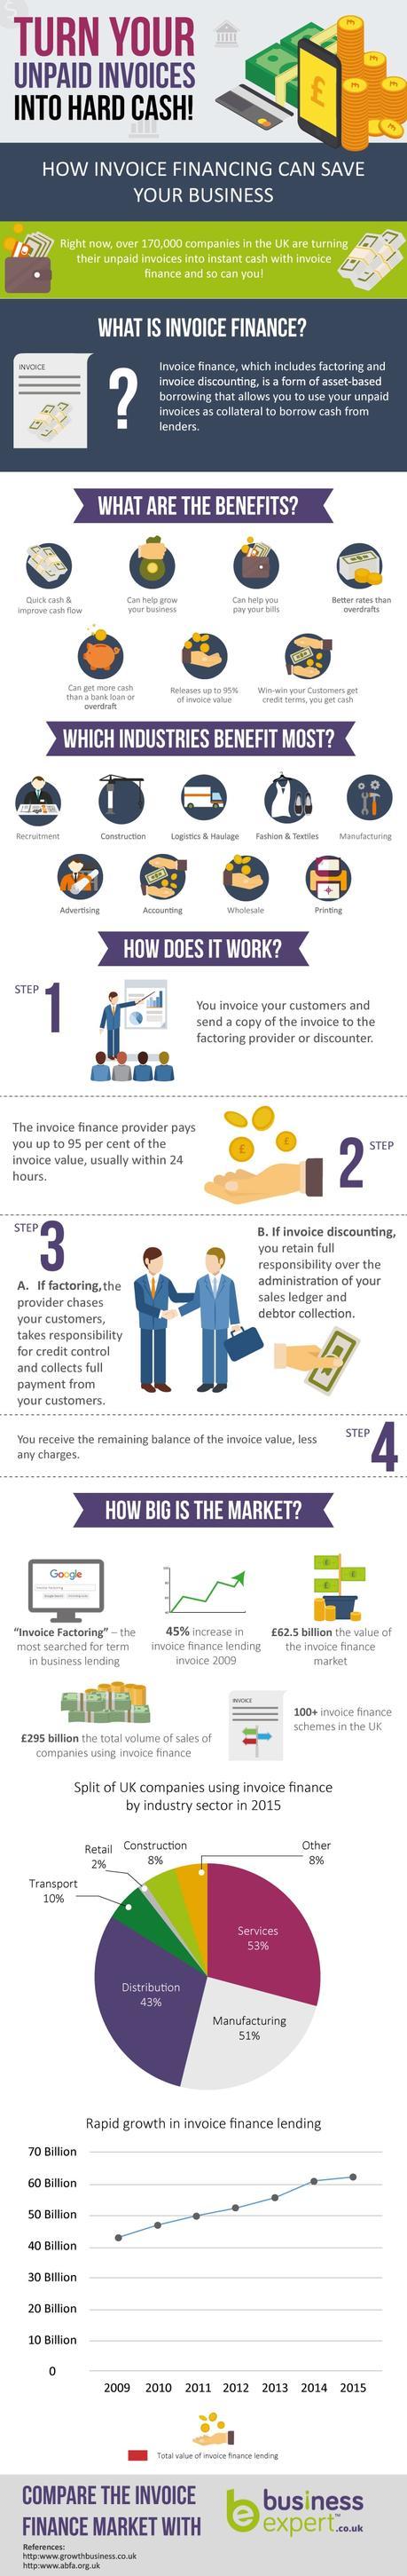 invoice-finance-infographic-min